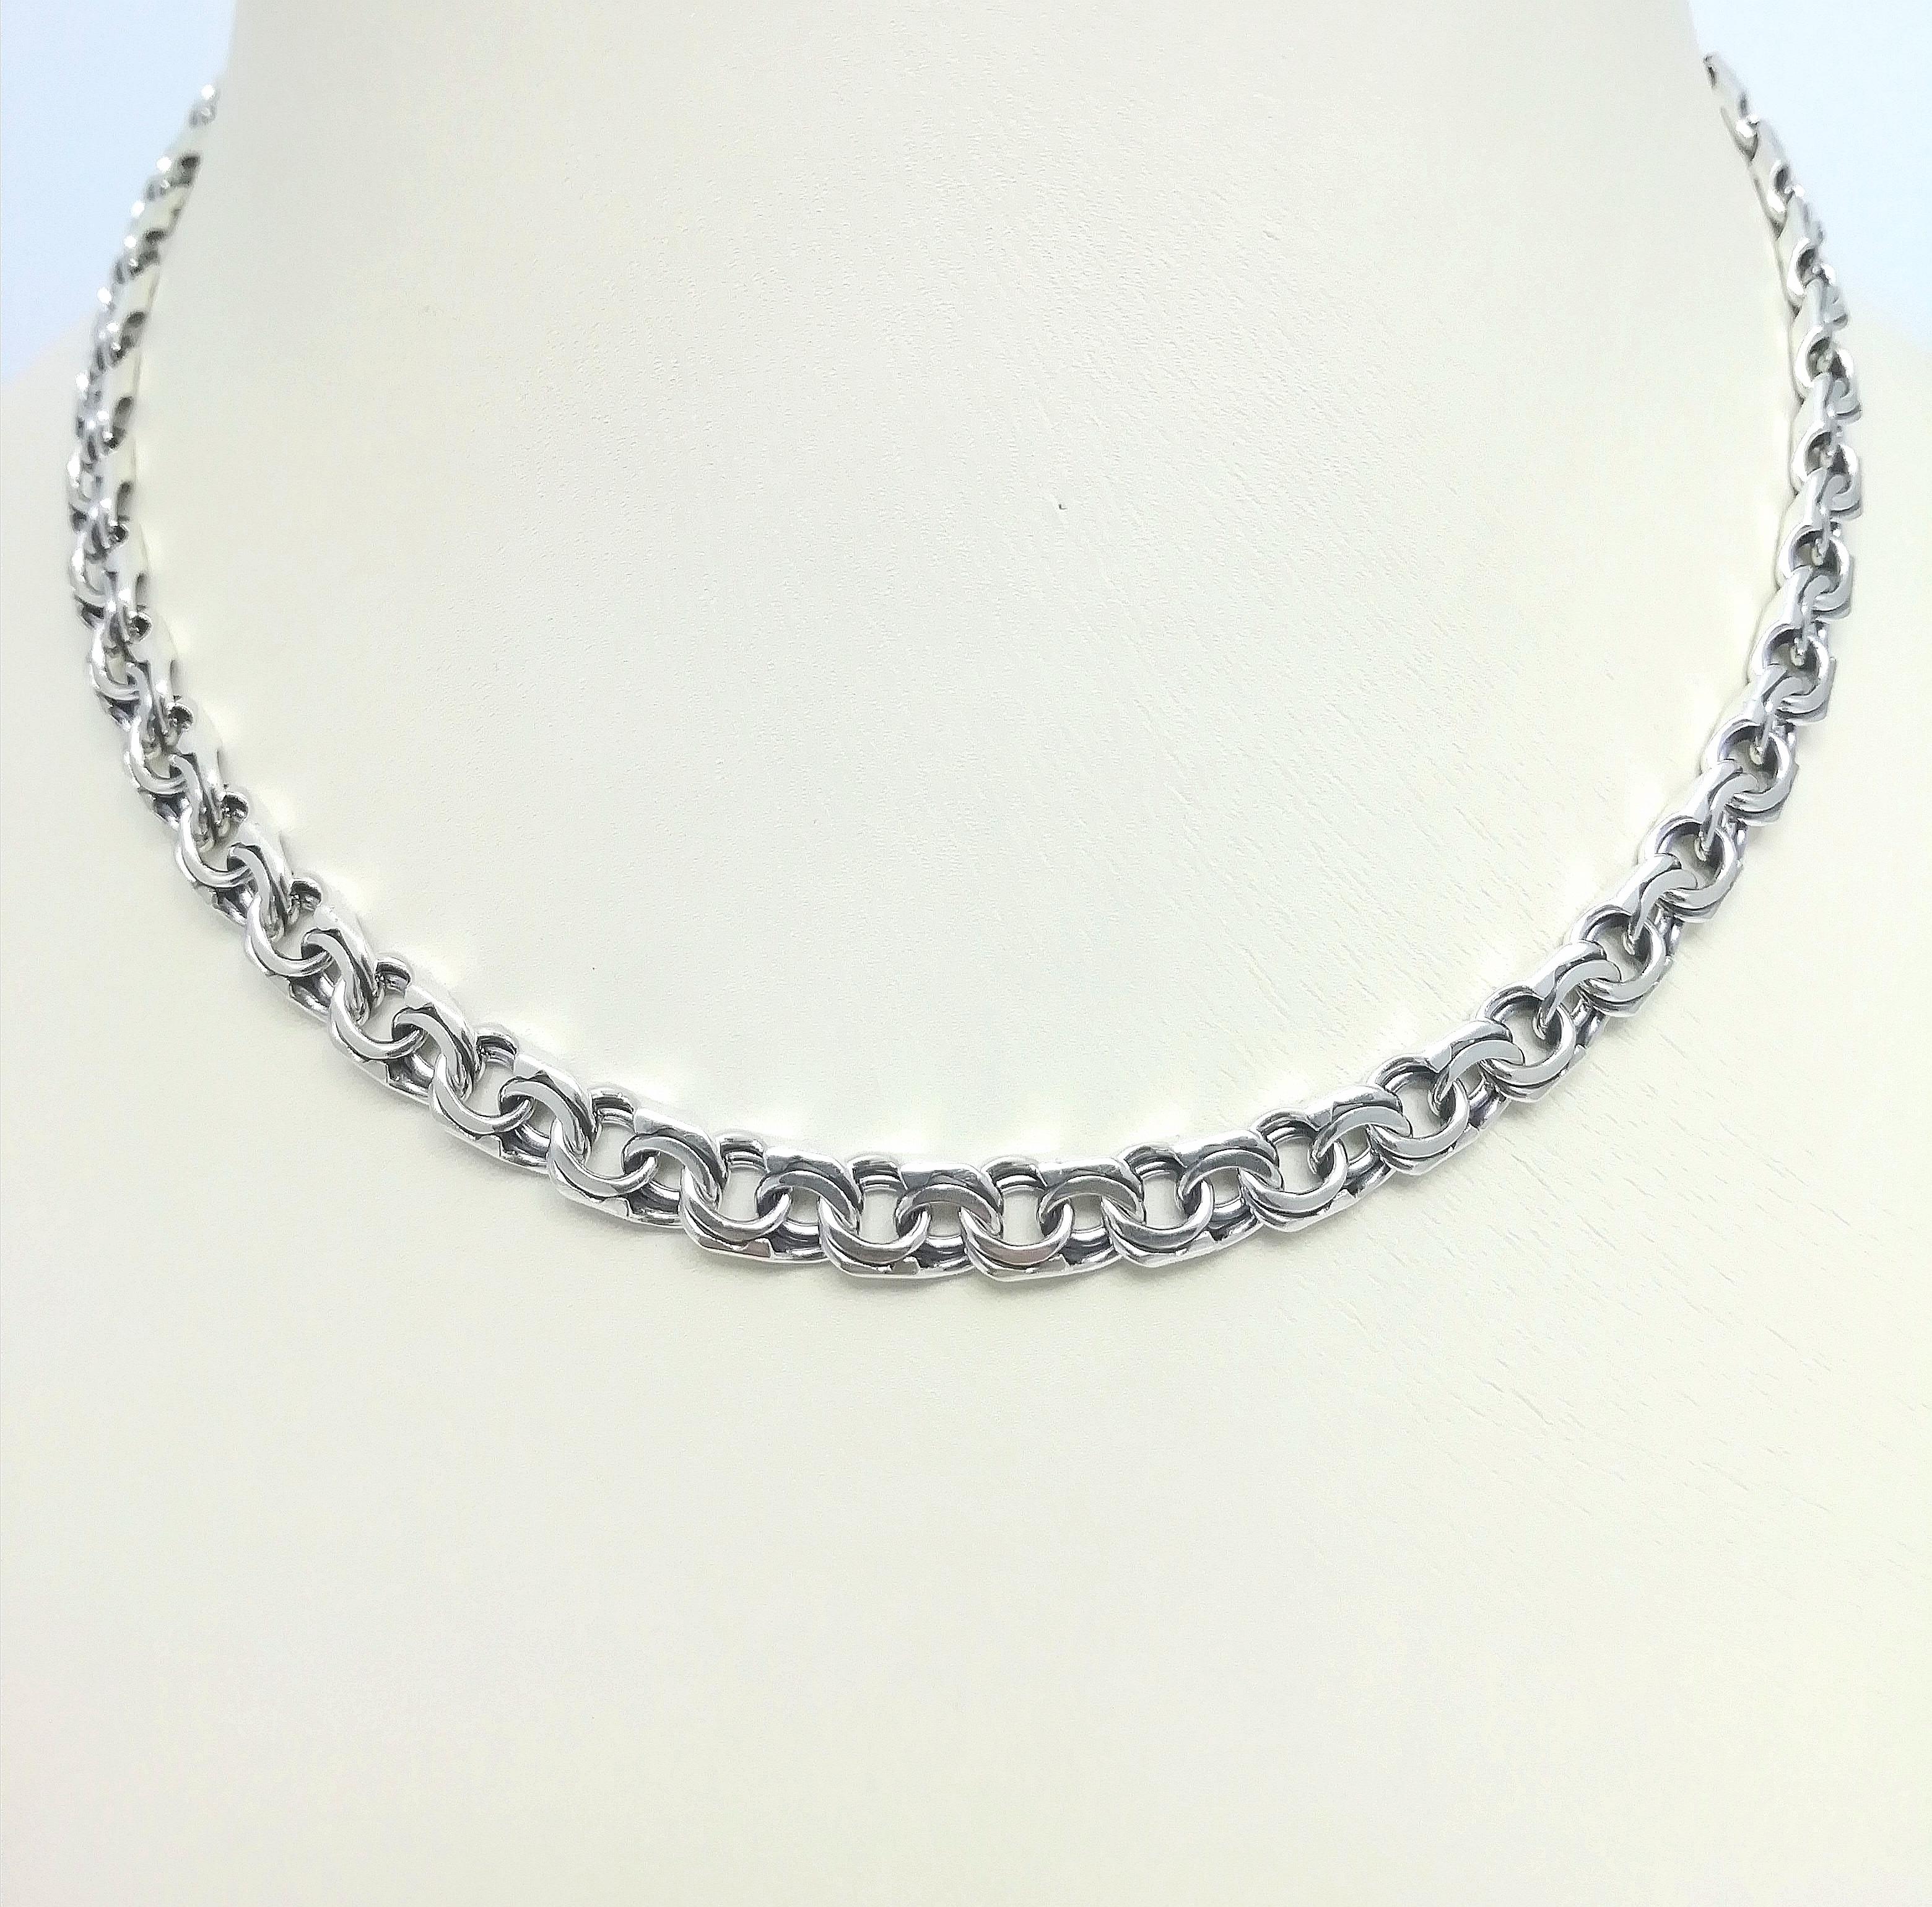 Серебро цепь дк240920-148 35,60гр